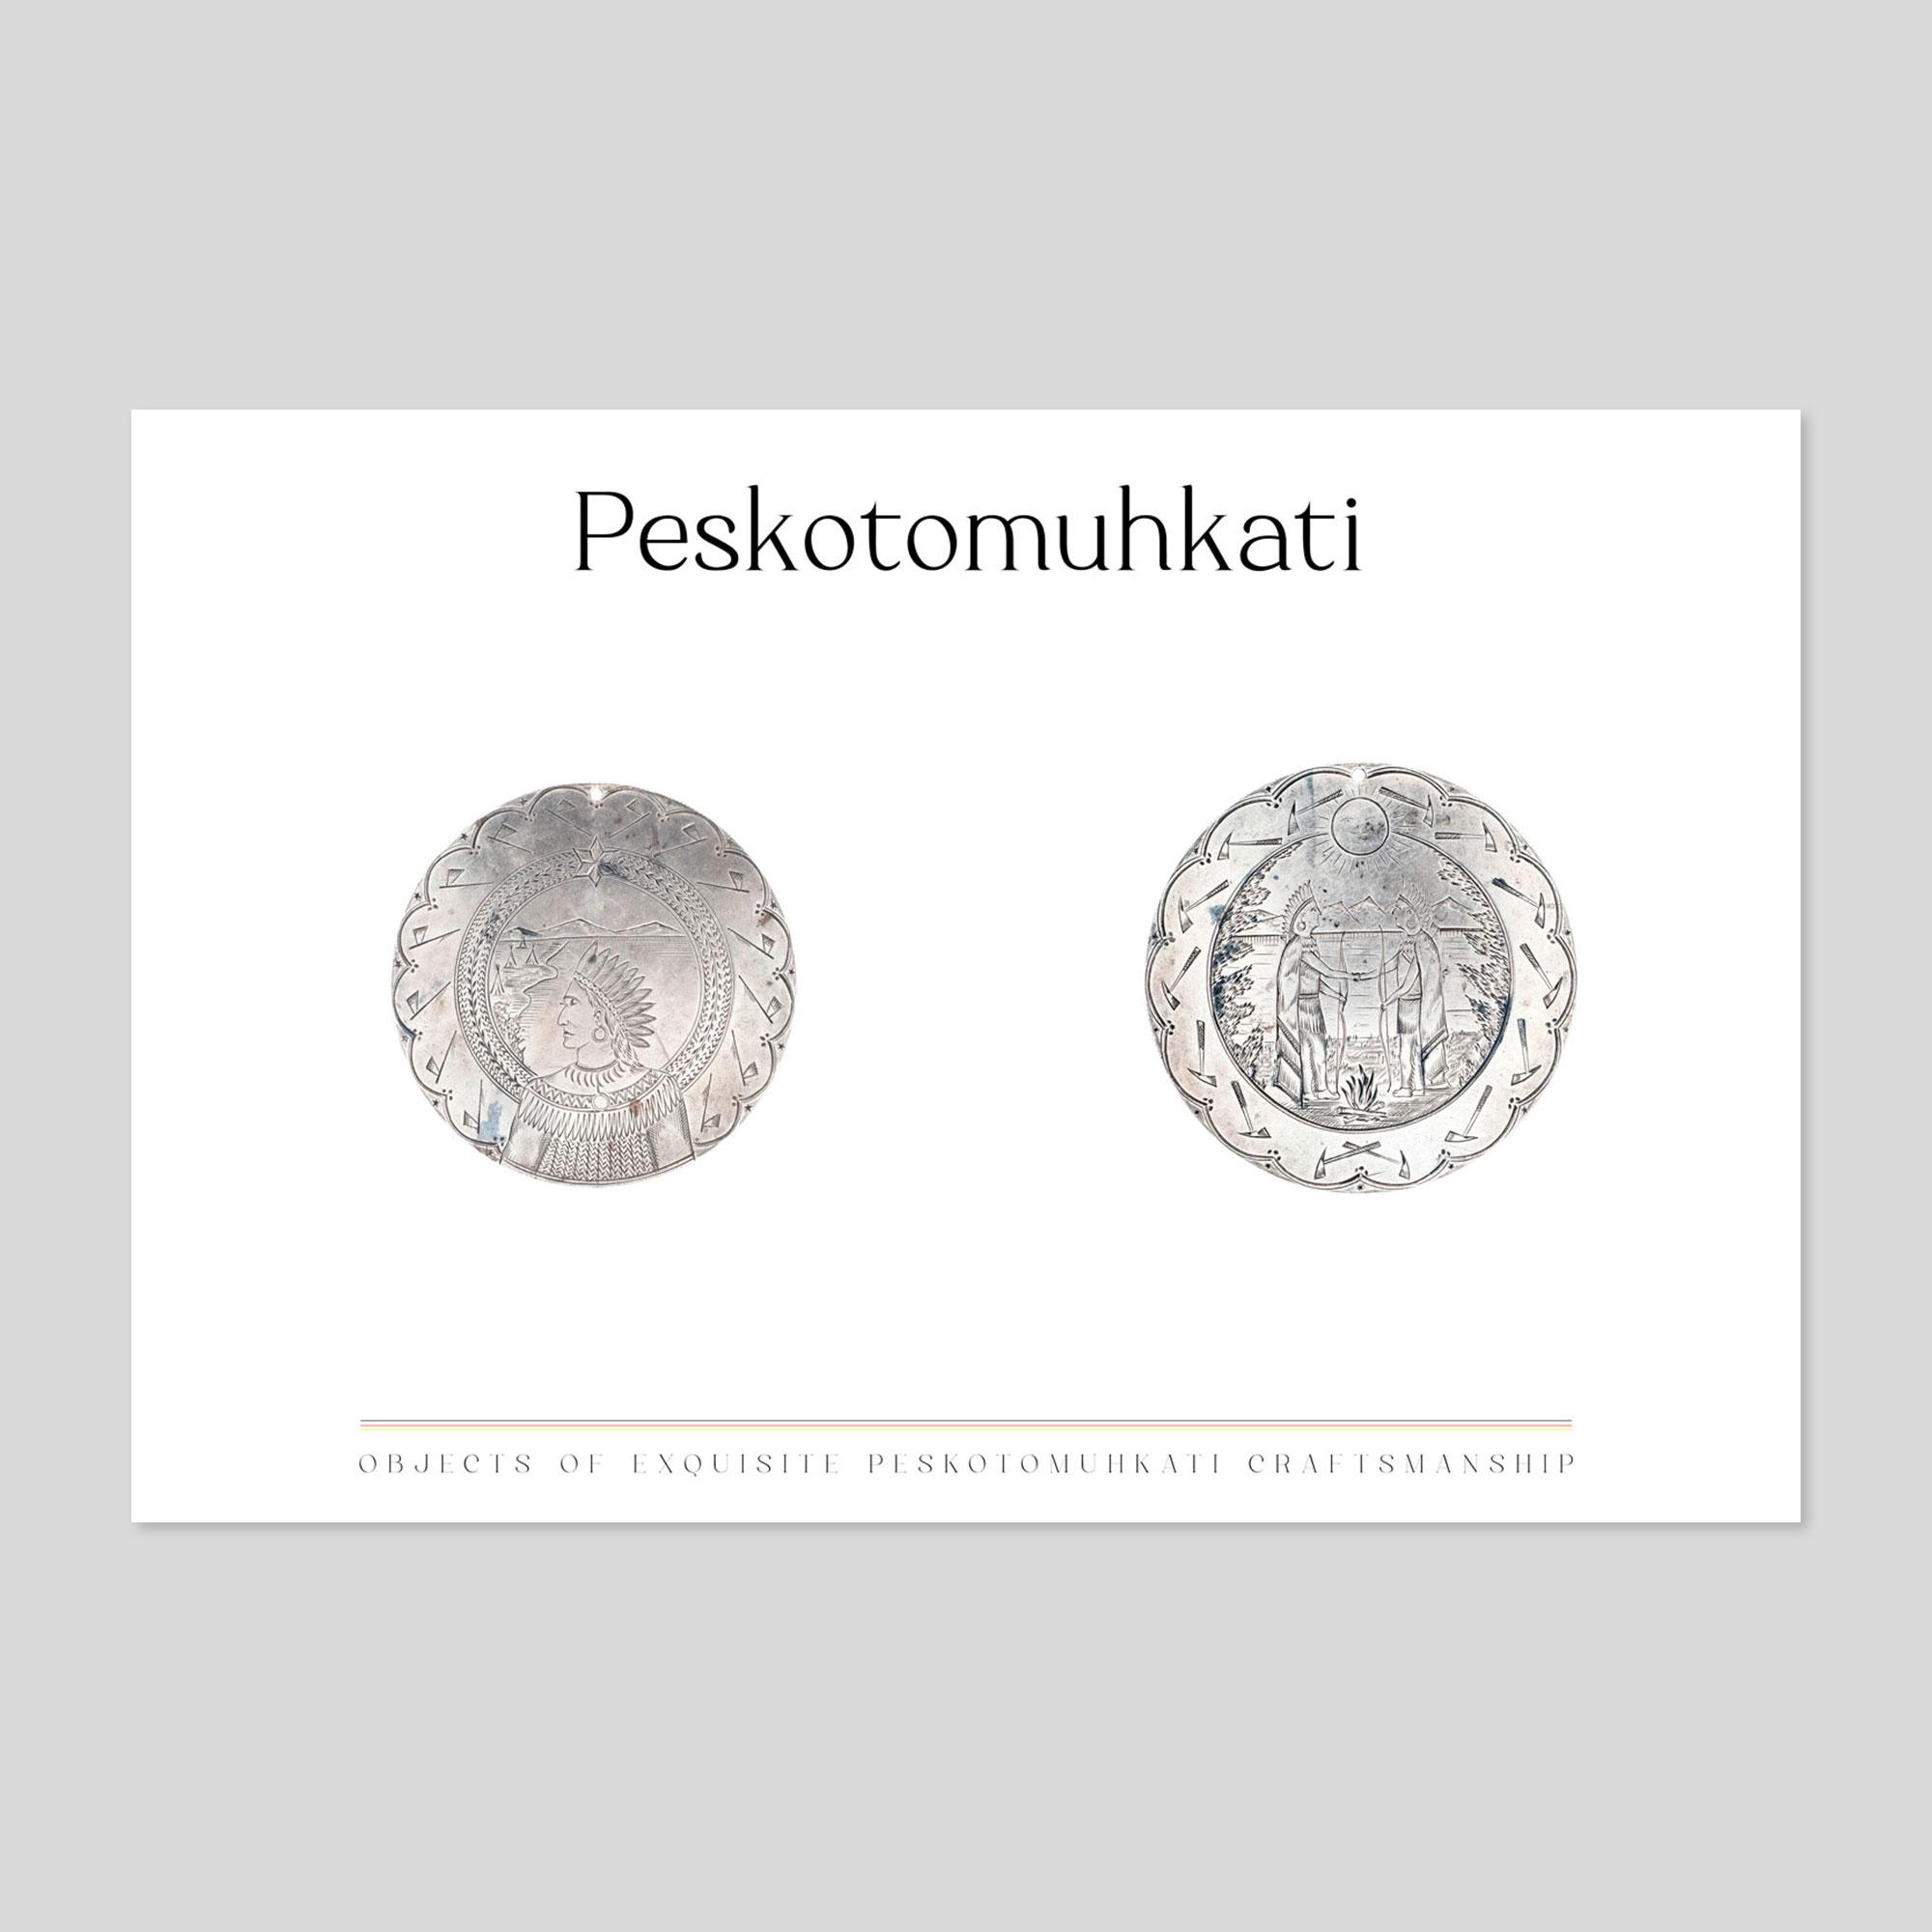 010-peskotomuhkati-chief-medal-territory-medal-sakomawi-noskonomakon-ktahkomiqewi-web